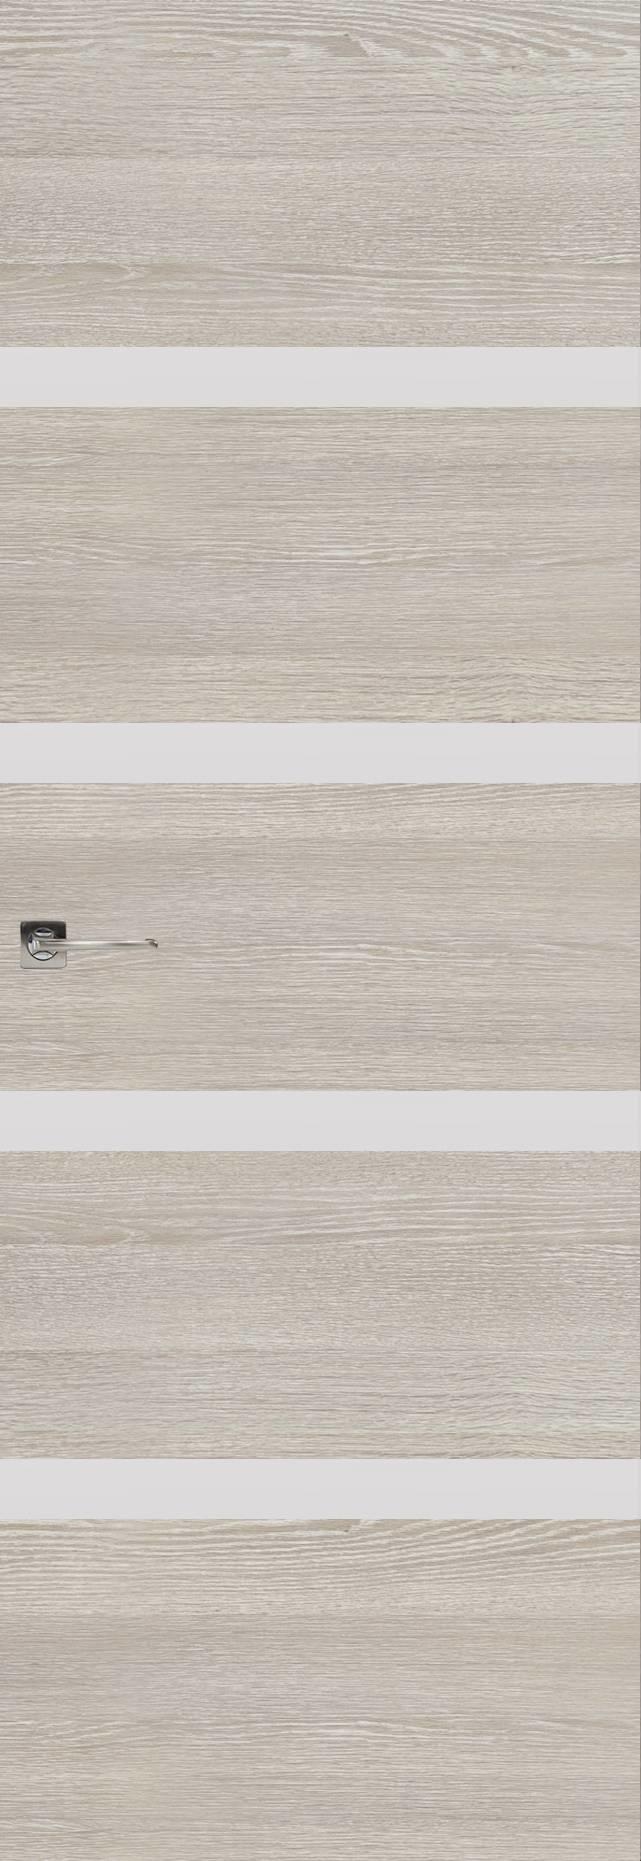 Tivoli Д-4 Невидимка цвет - Серый дуб Без стекла (ДГ)